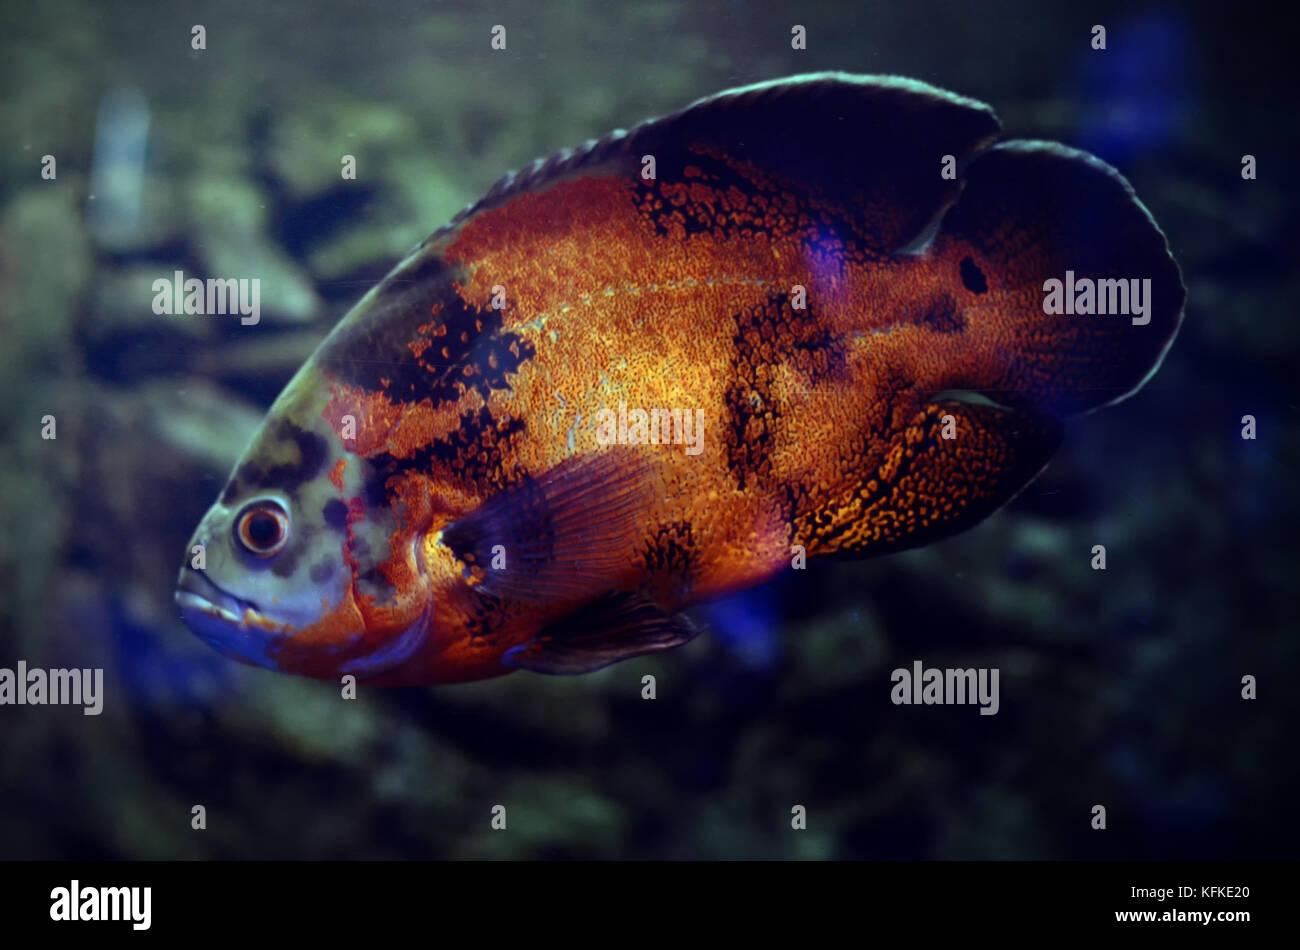 Oscar Fish In Dark Aquarium Water South America Amazon River Fish